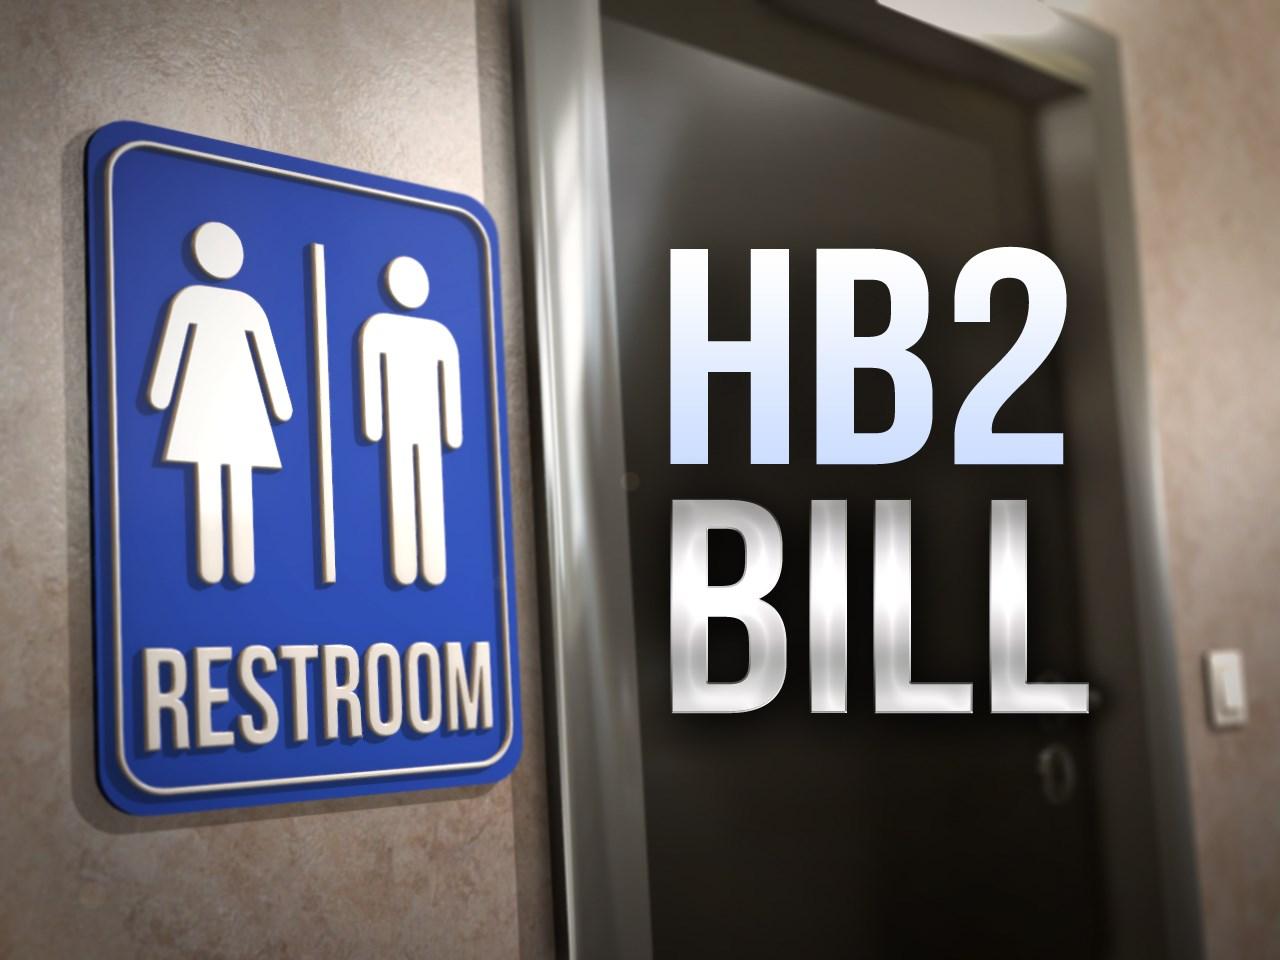 39 Bathroom Bill 39 To Cost North Carolina